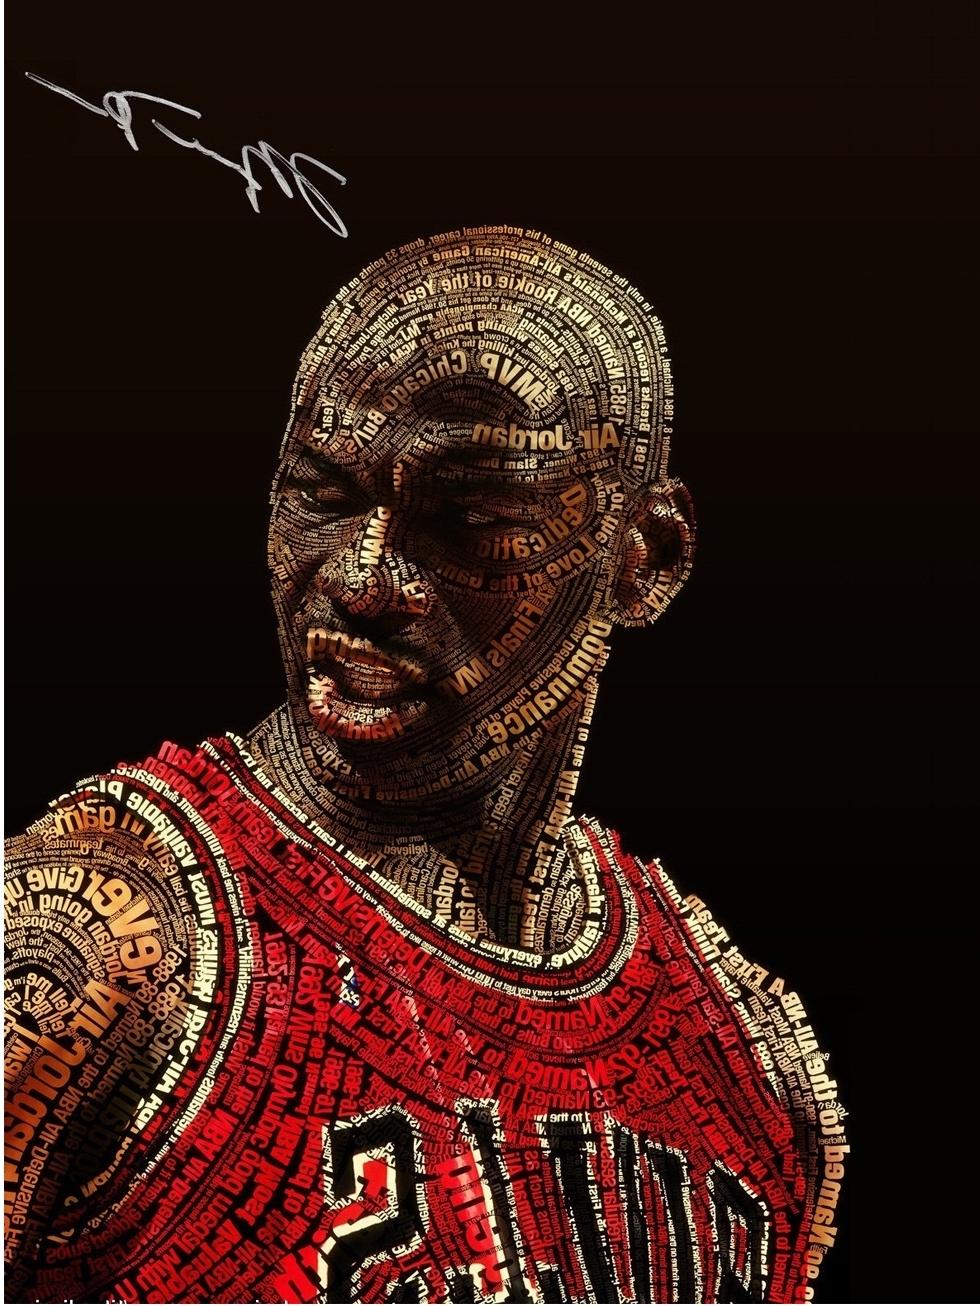 2017 Free Shipping Nba Michael Jordan Poster Home Decor Painting Throughout Recent Michael Jordan Canvas Wall Art (Gallery 9 of 15)